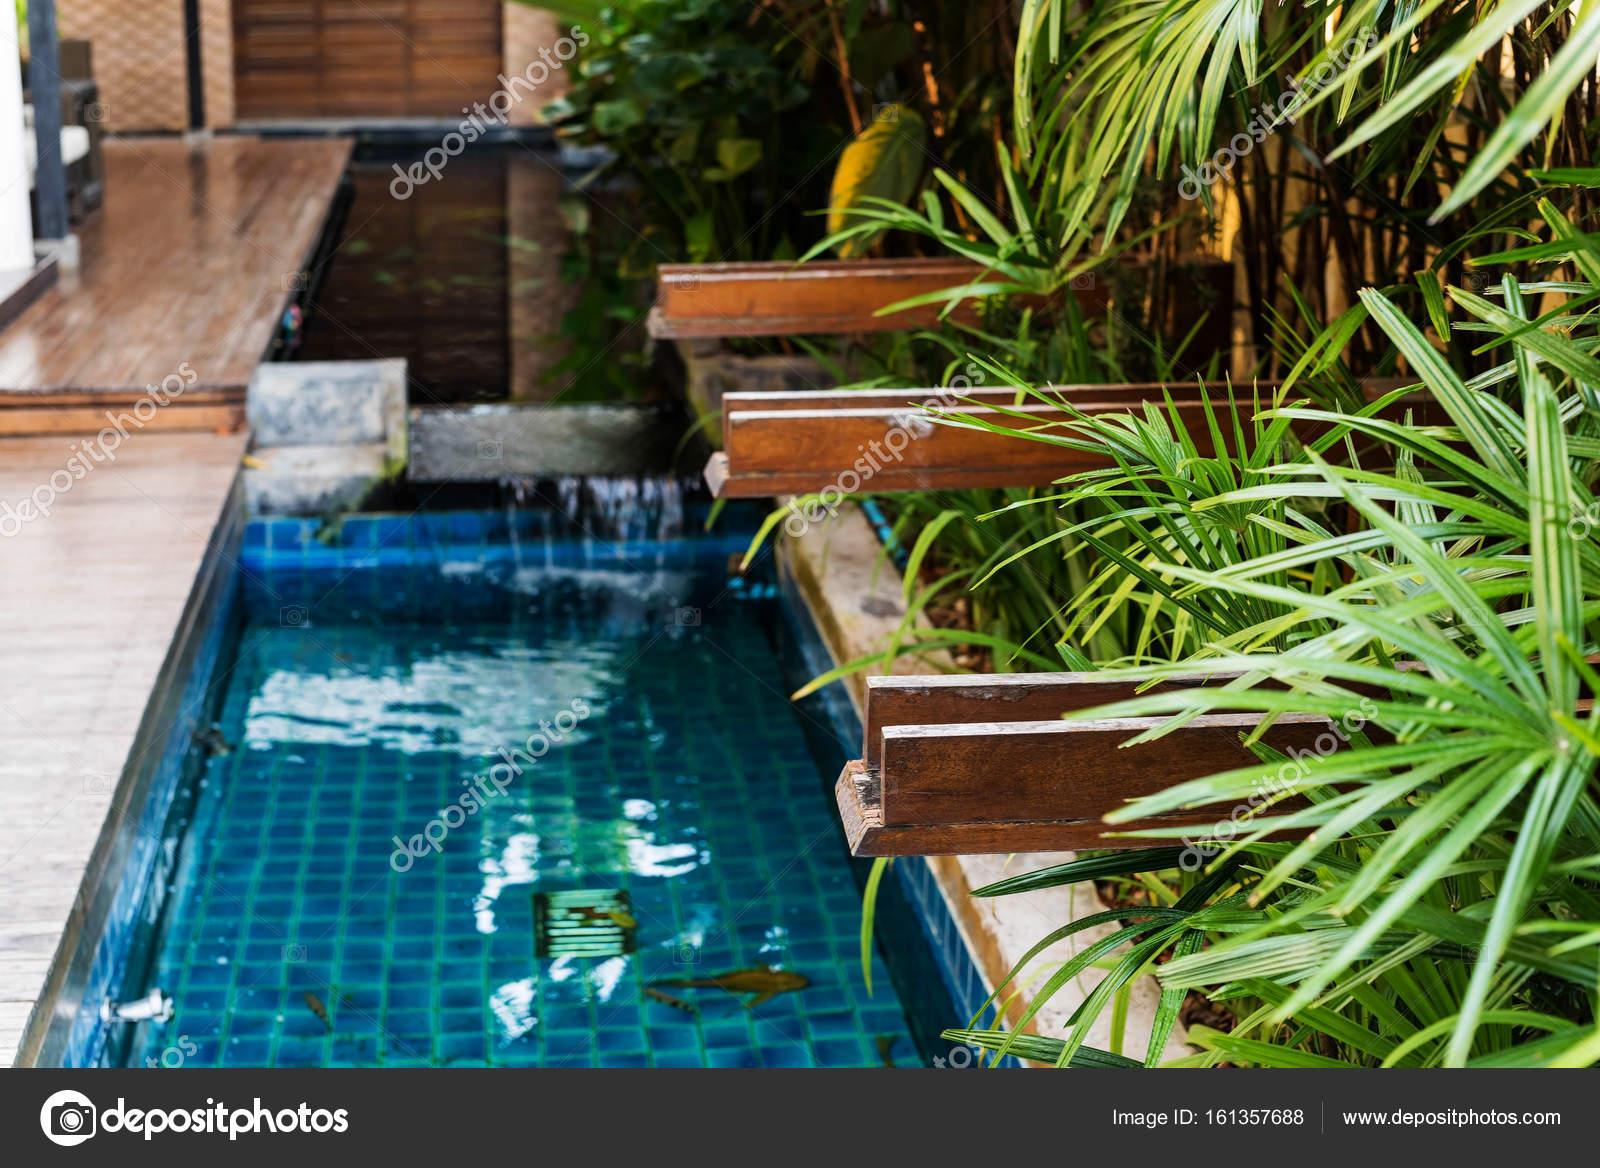 luxus garten haus interieur stockfoto blanscape 161357688. Black Bedroom Furniture Sets. Home Design Ideas